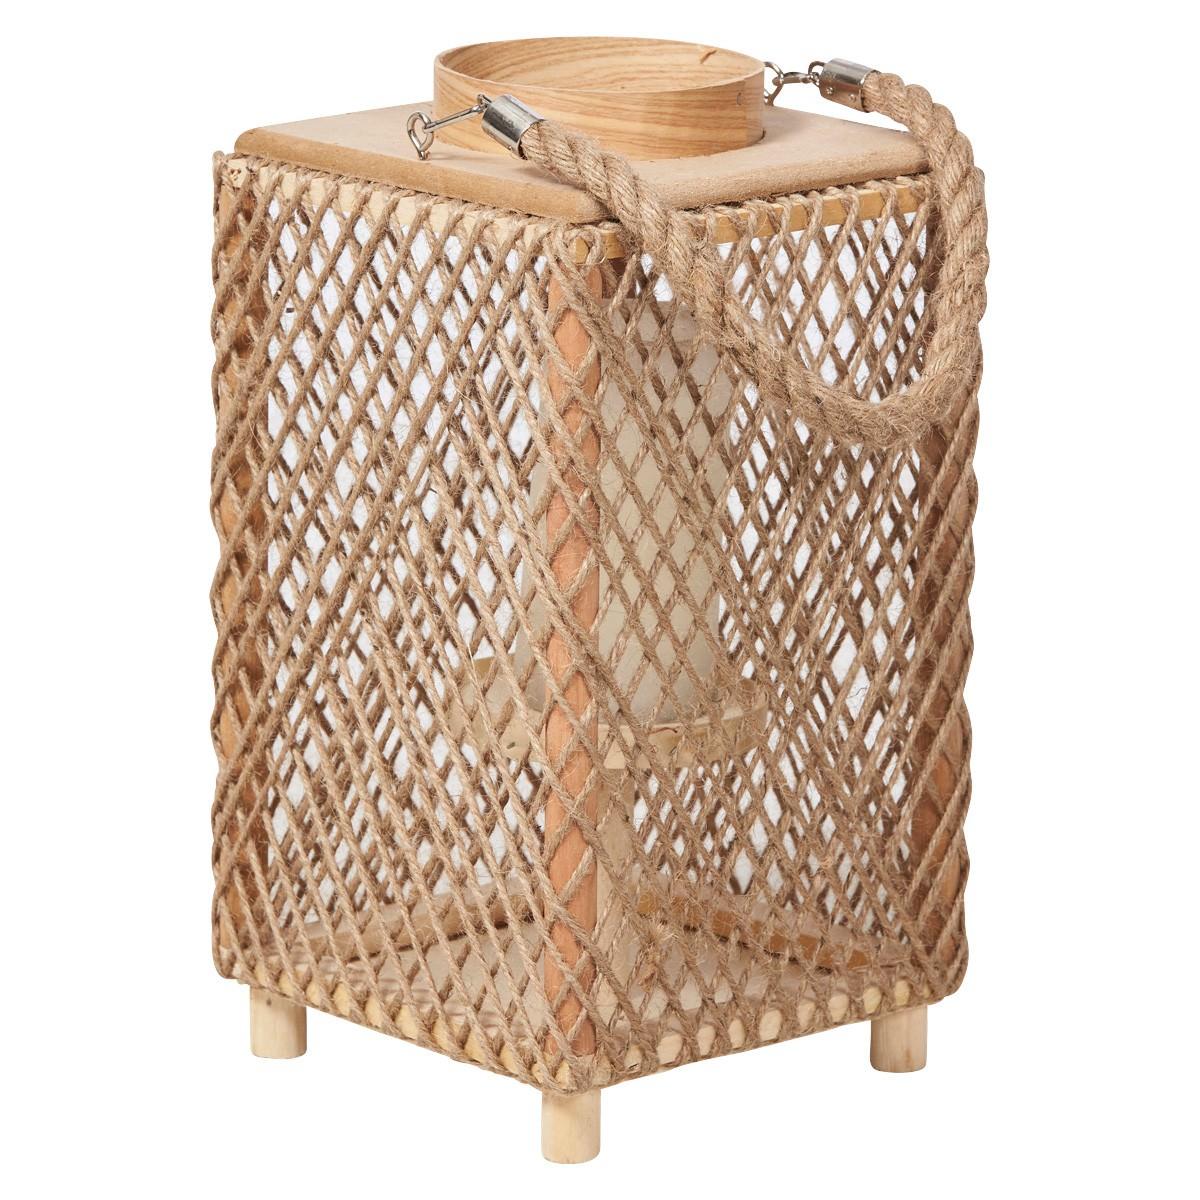 Hamp Hemp Rope Lantern, Medium, Natural